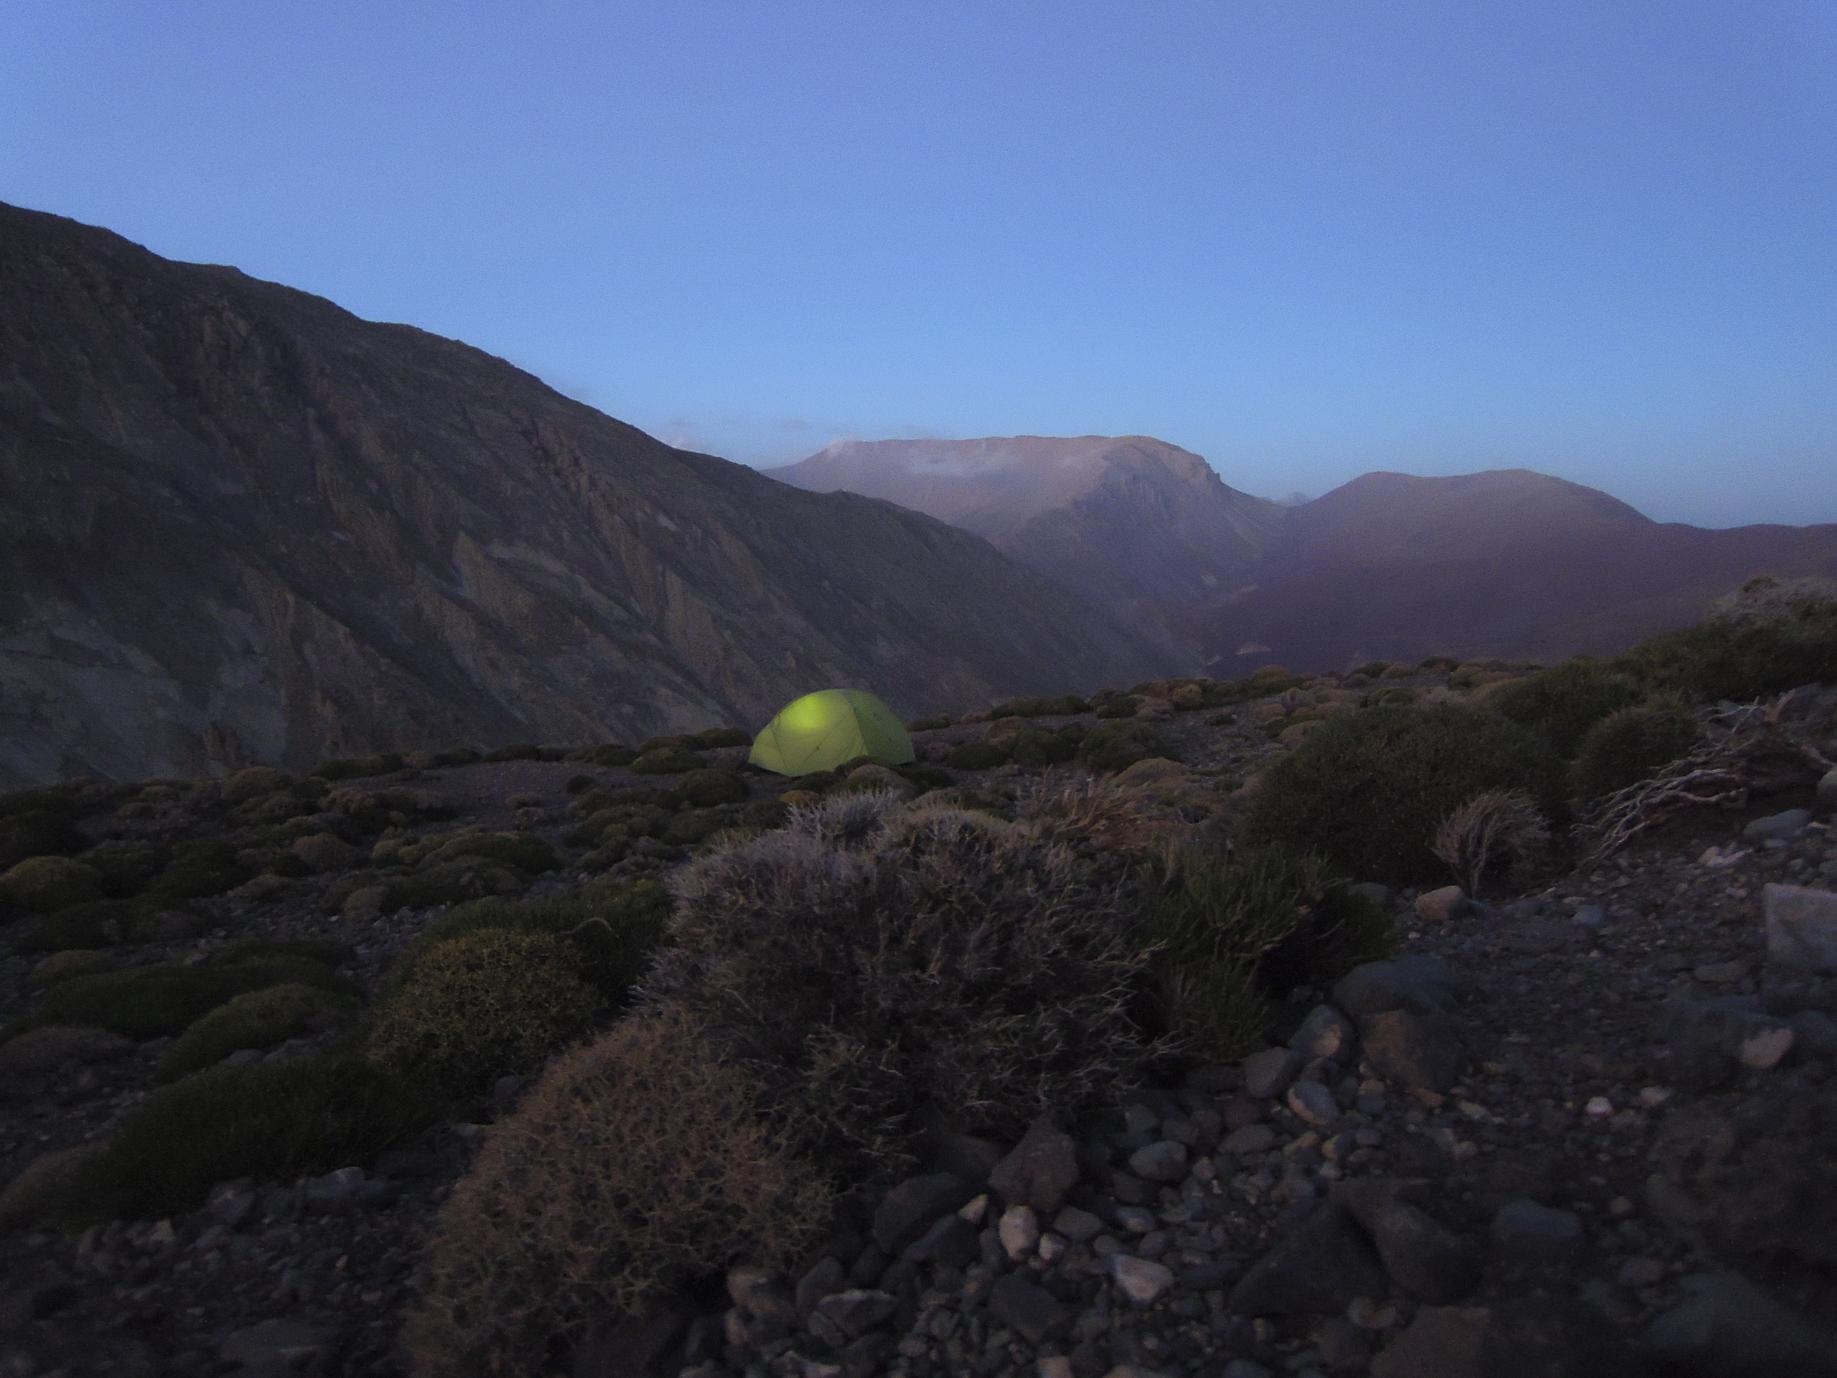 Hoher Atlas, Sabbatical, Trekking, organic17